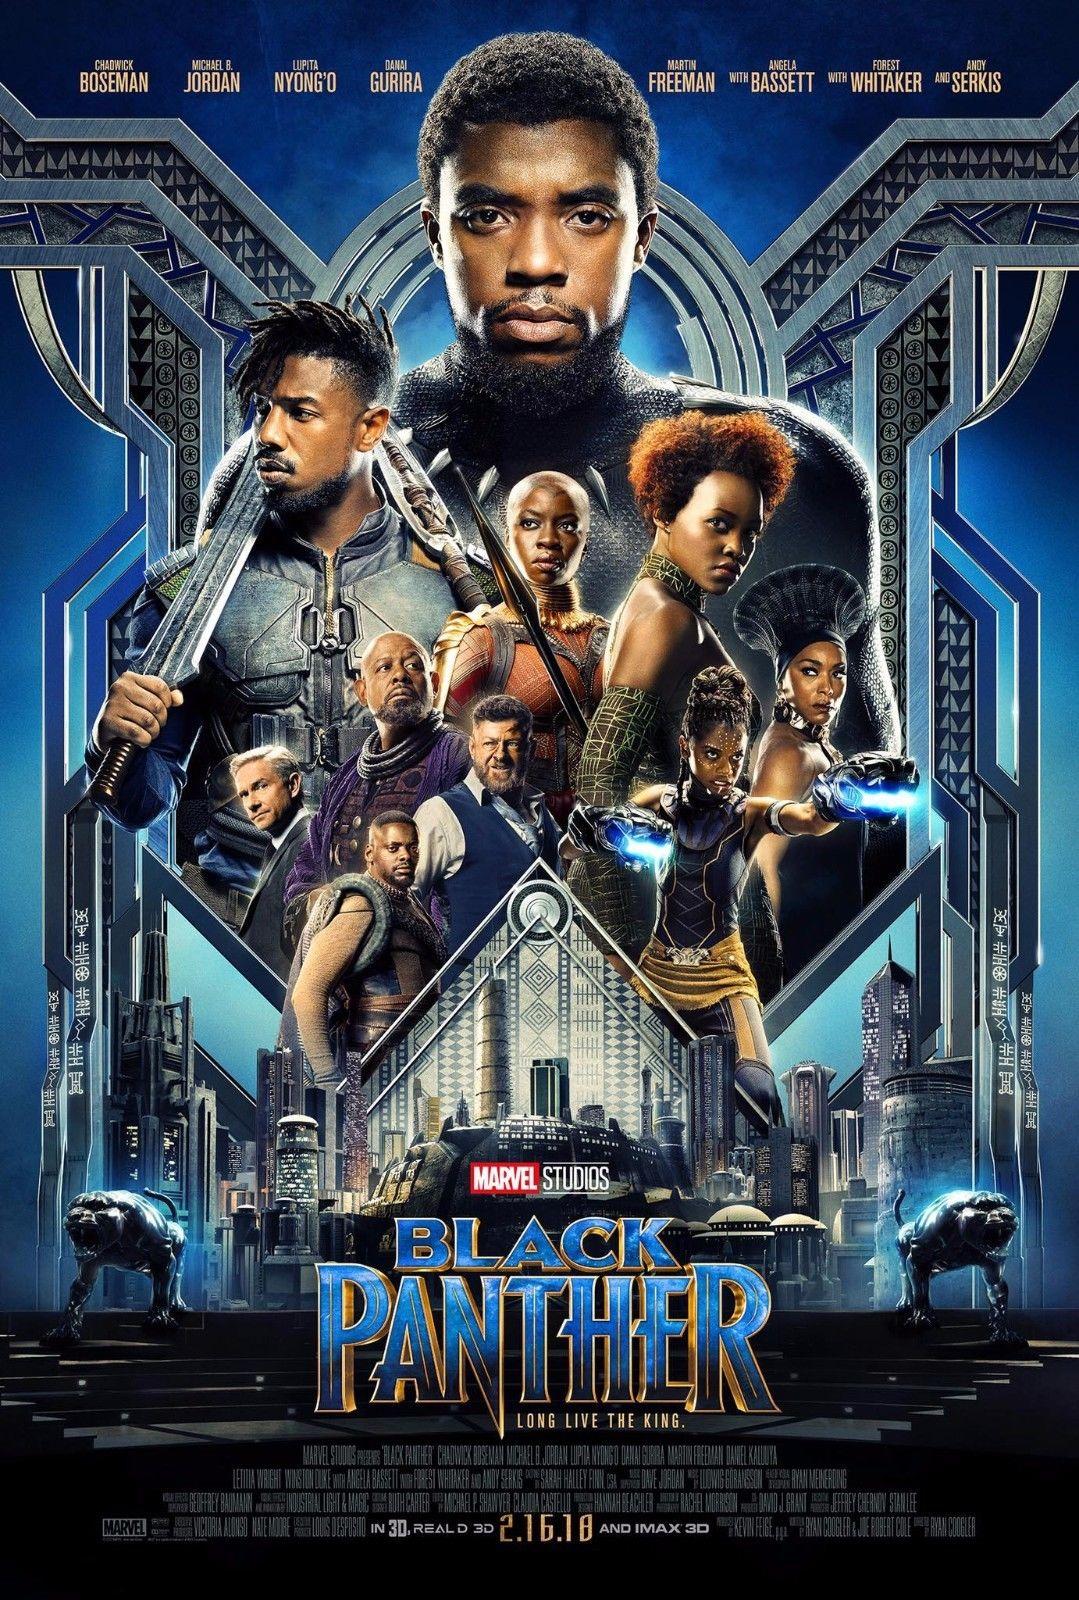 Black-Panther-Movie-Poster-2018-13x20-27x40-32x48.jpg